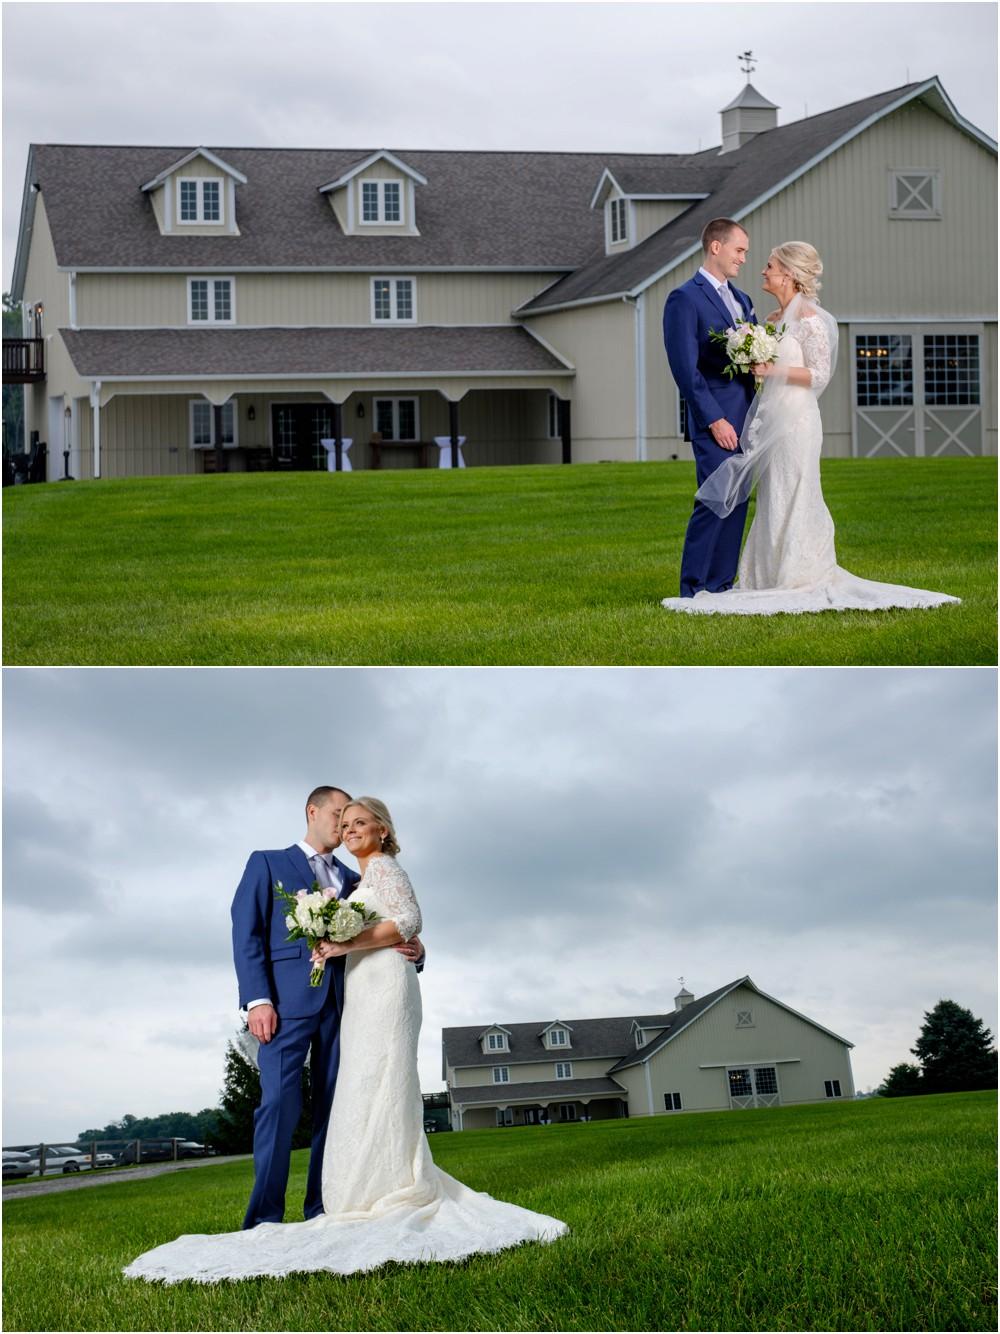 wedding-pictures-at-JLH-Wedding-Barn_0008.jpg